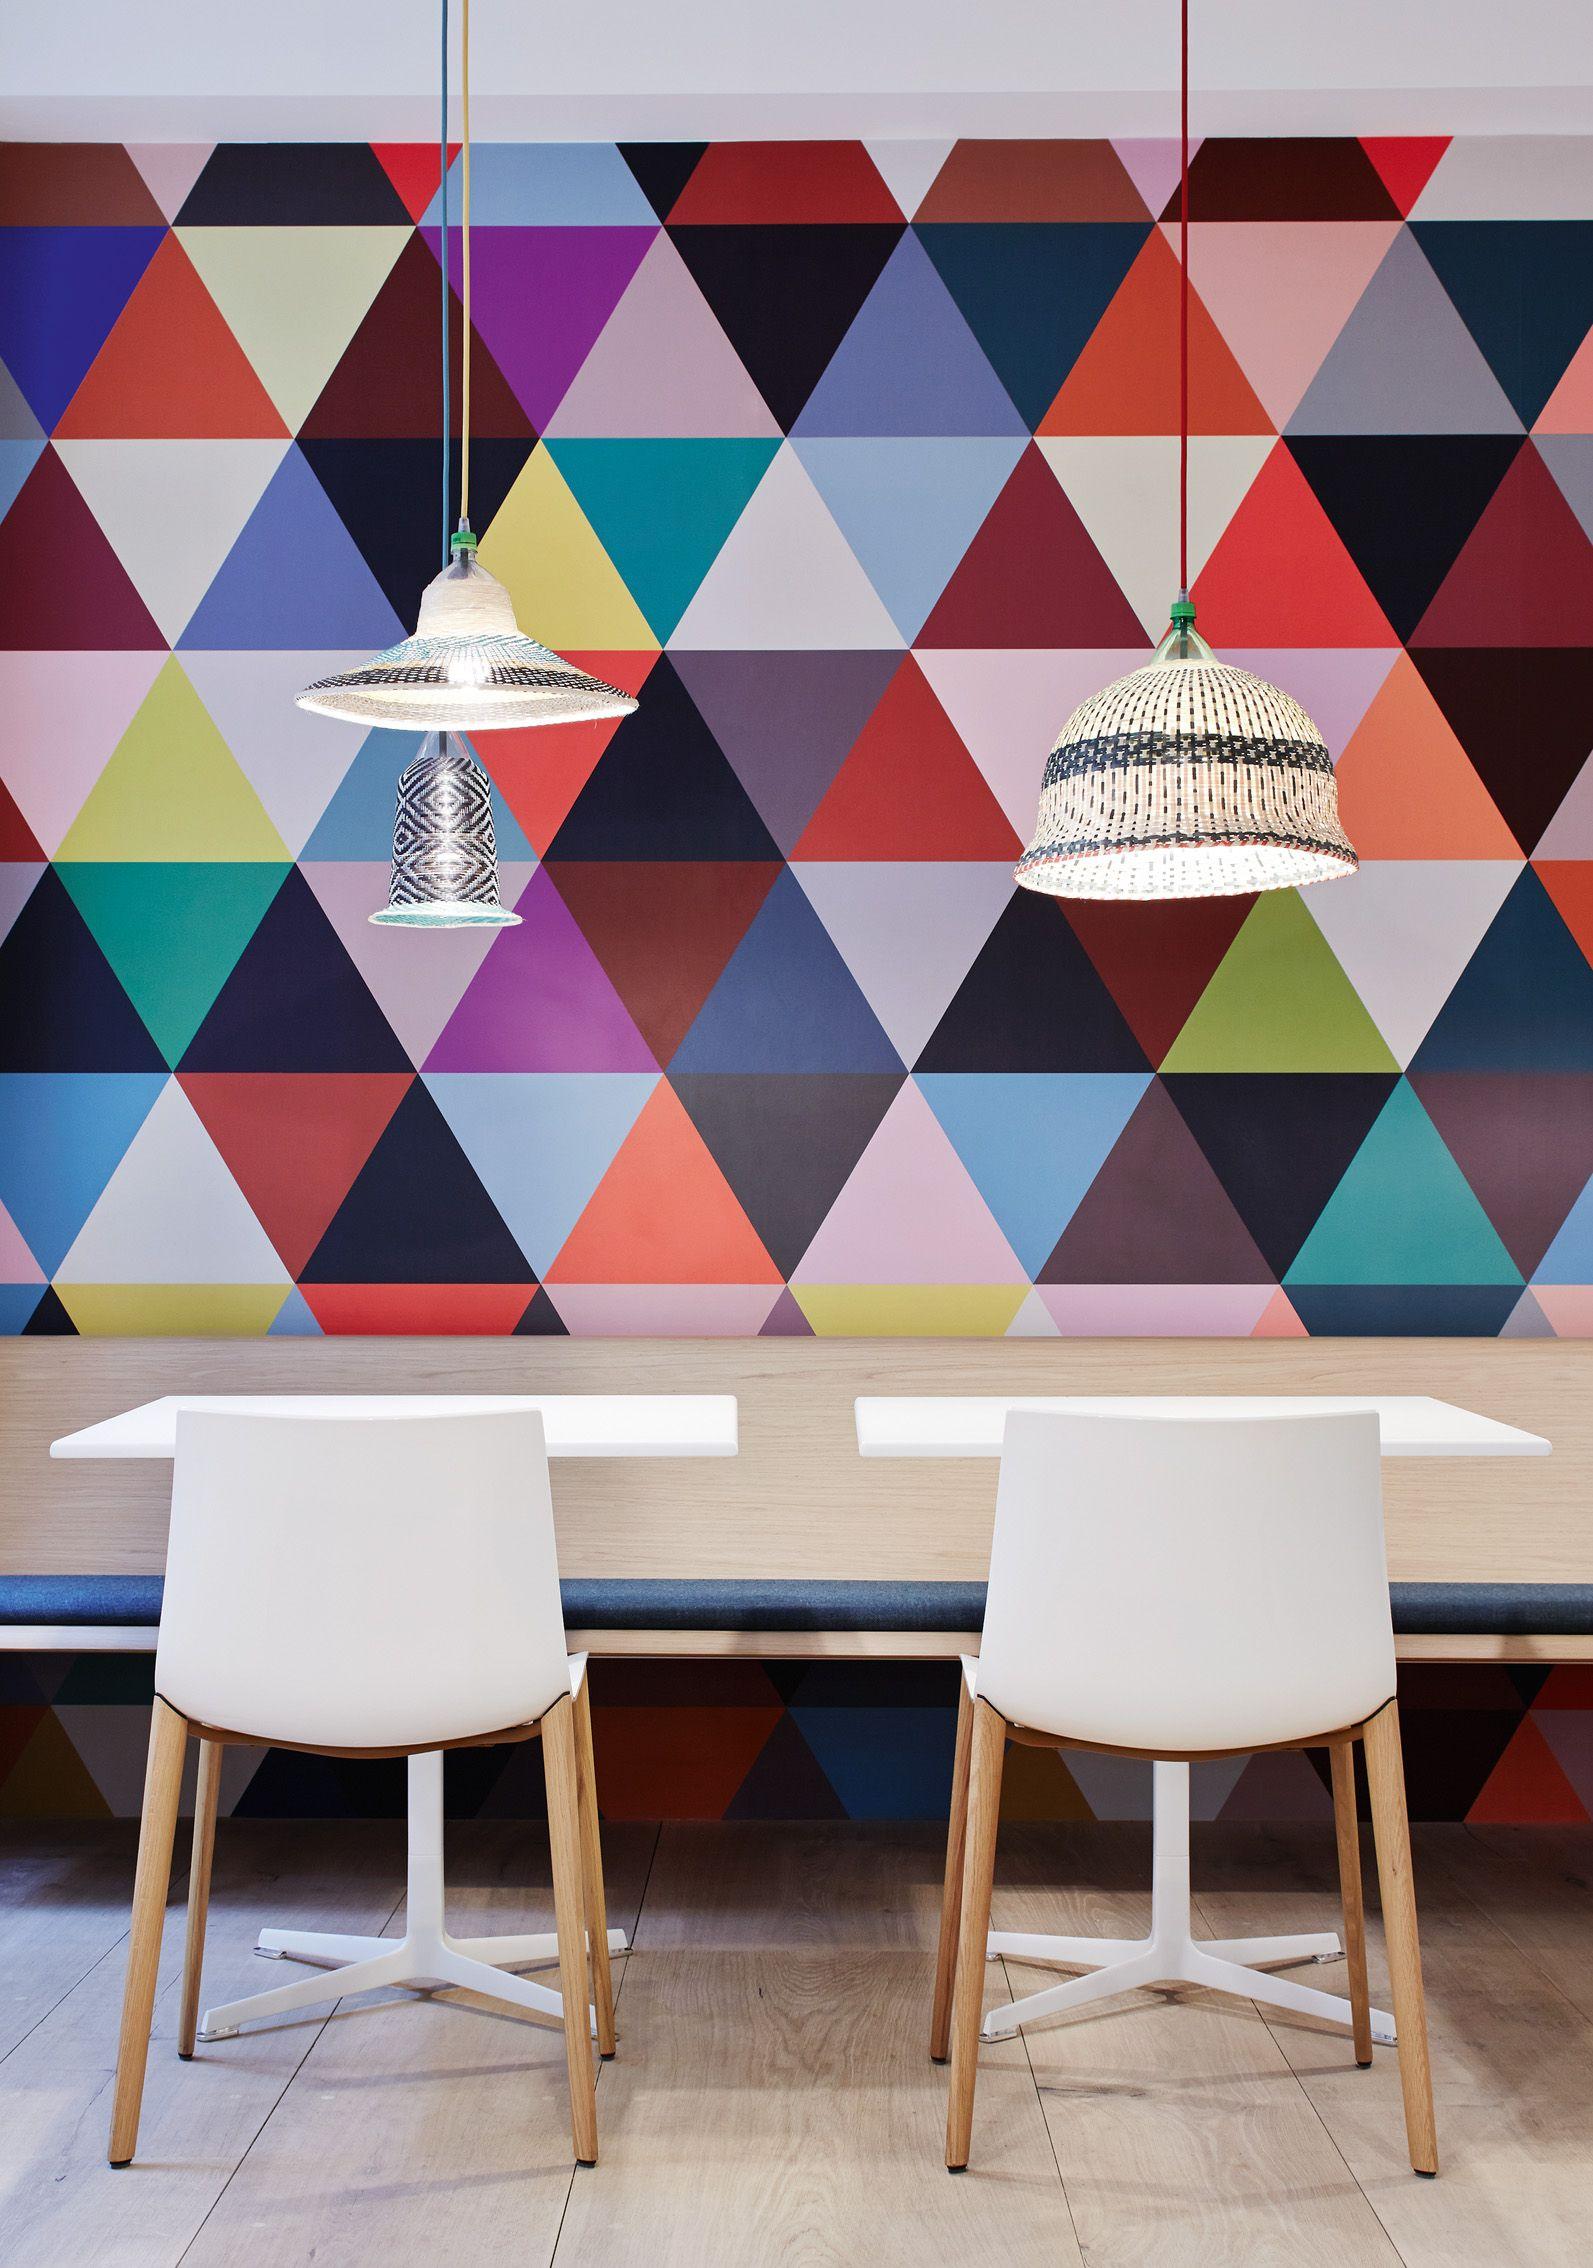 g rtner internationale m bel ausstellung showroom hamburg wall glass door floor graphics. Black Bedroom Furniture Sets. Home Design Ideas